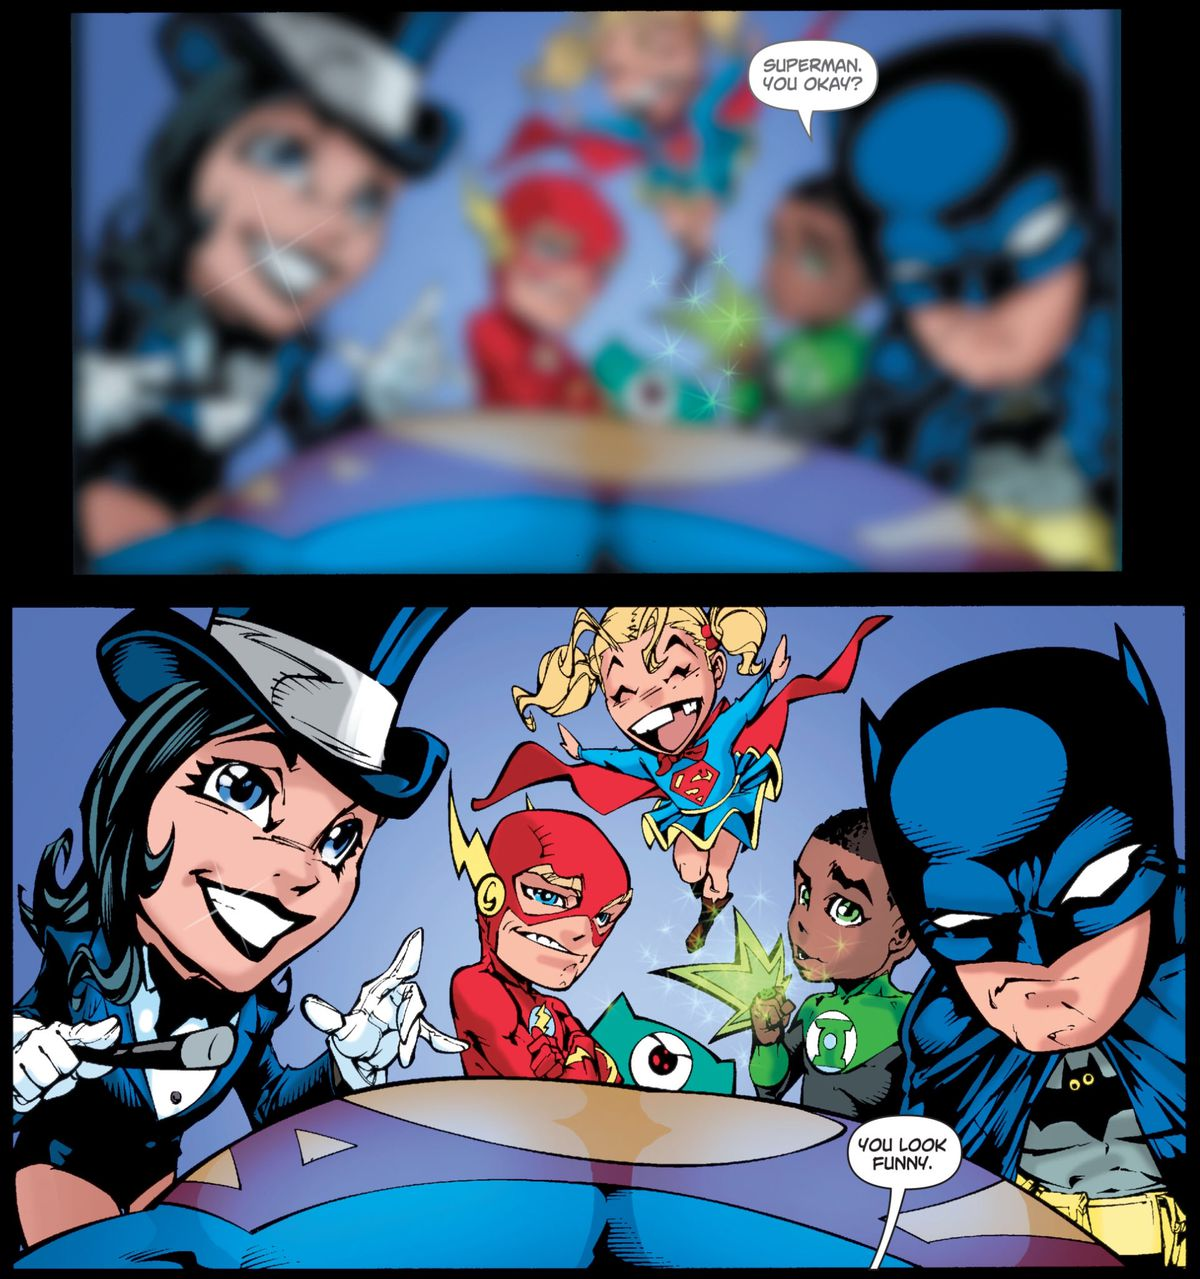 Cartoony, big-headed versions of the Zatanna, Flash, Supergirl, Green Lantern, and Batman hover around Superman as he wakes up, in Superman/Batman # 46, DC Comics (2008).